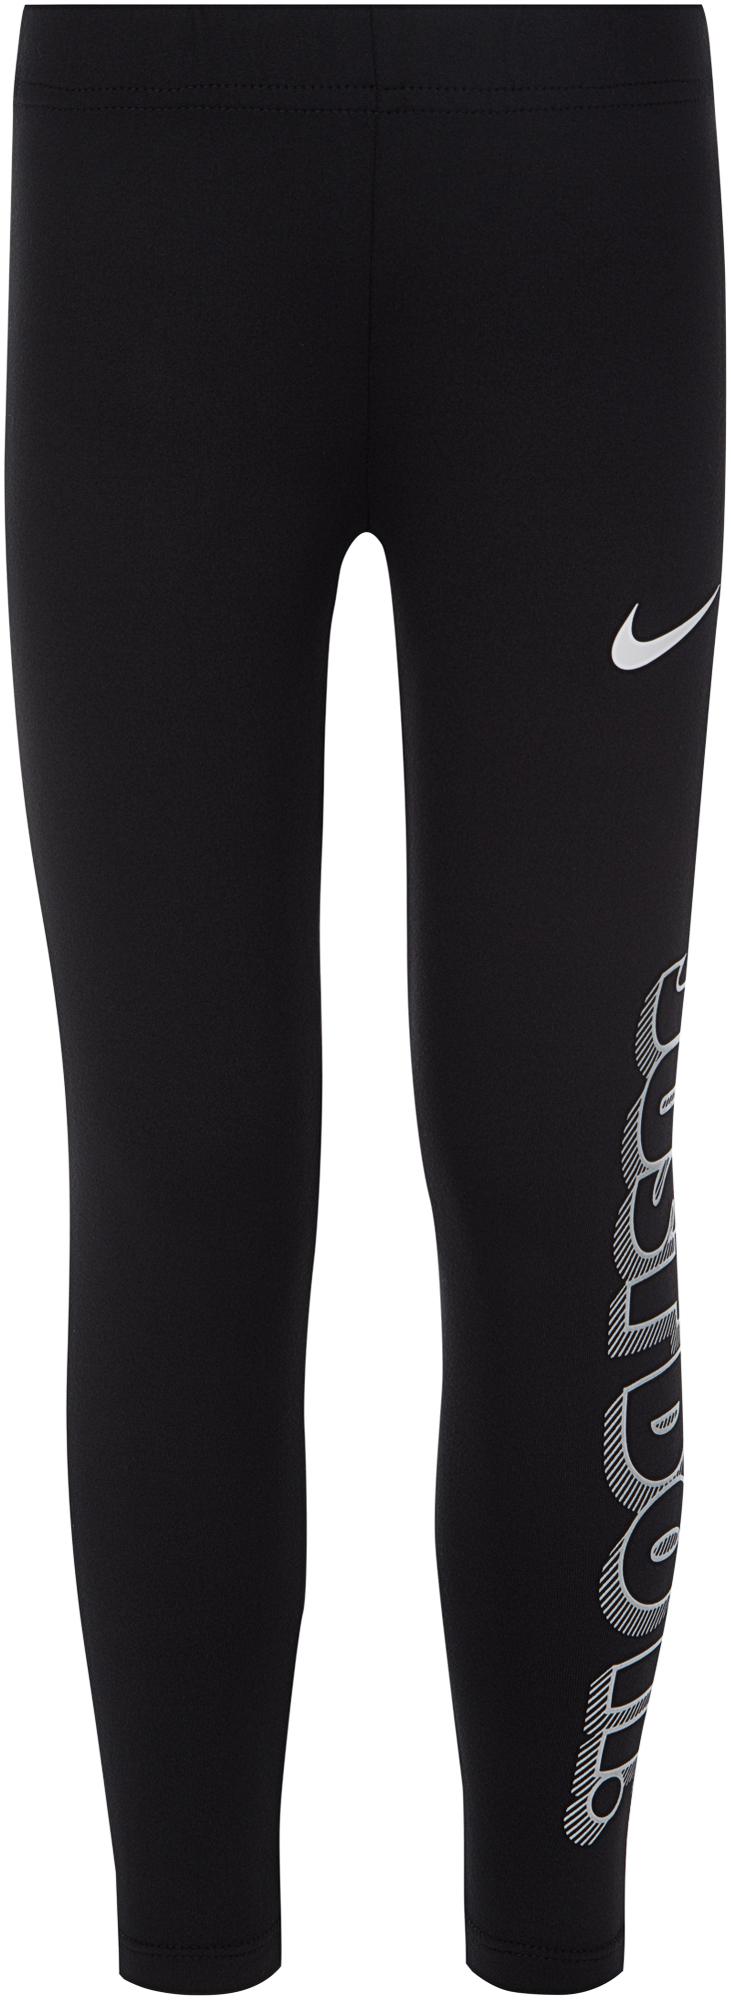 Nike Легинсы для девочек JDI, размер 122